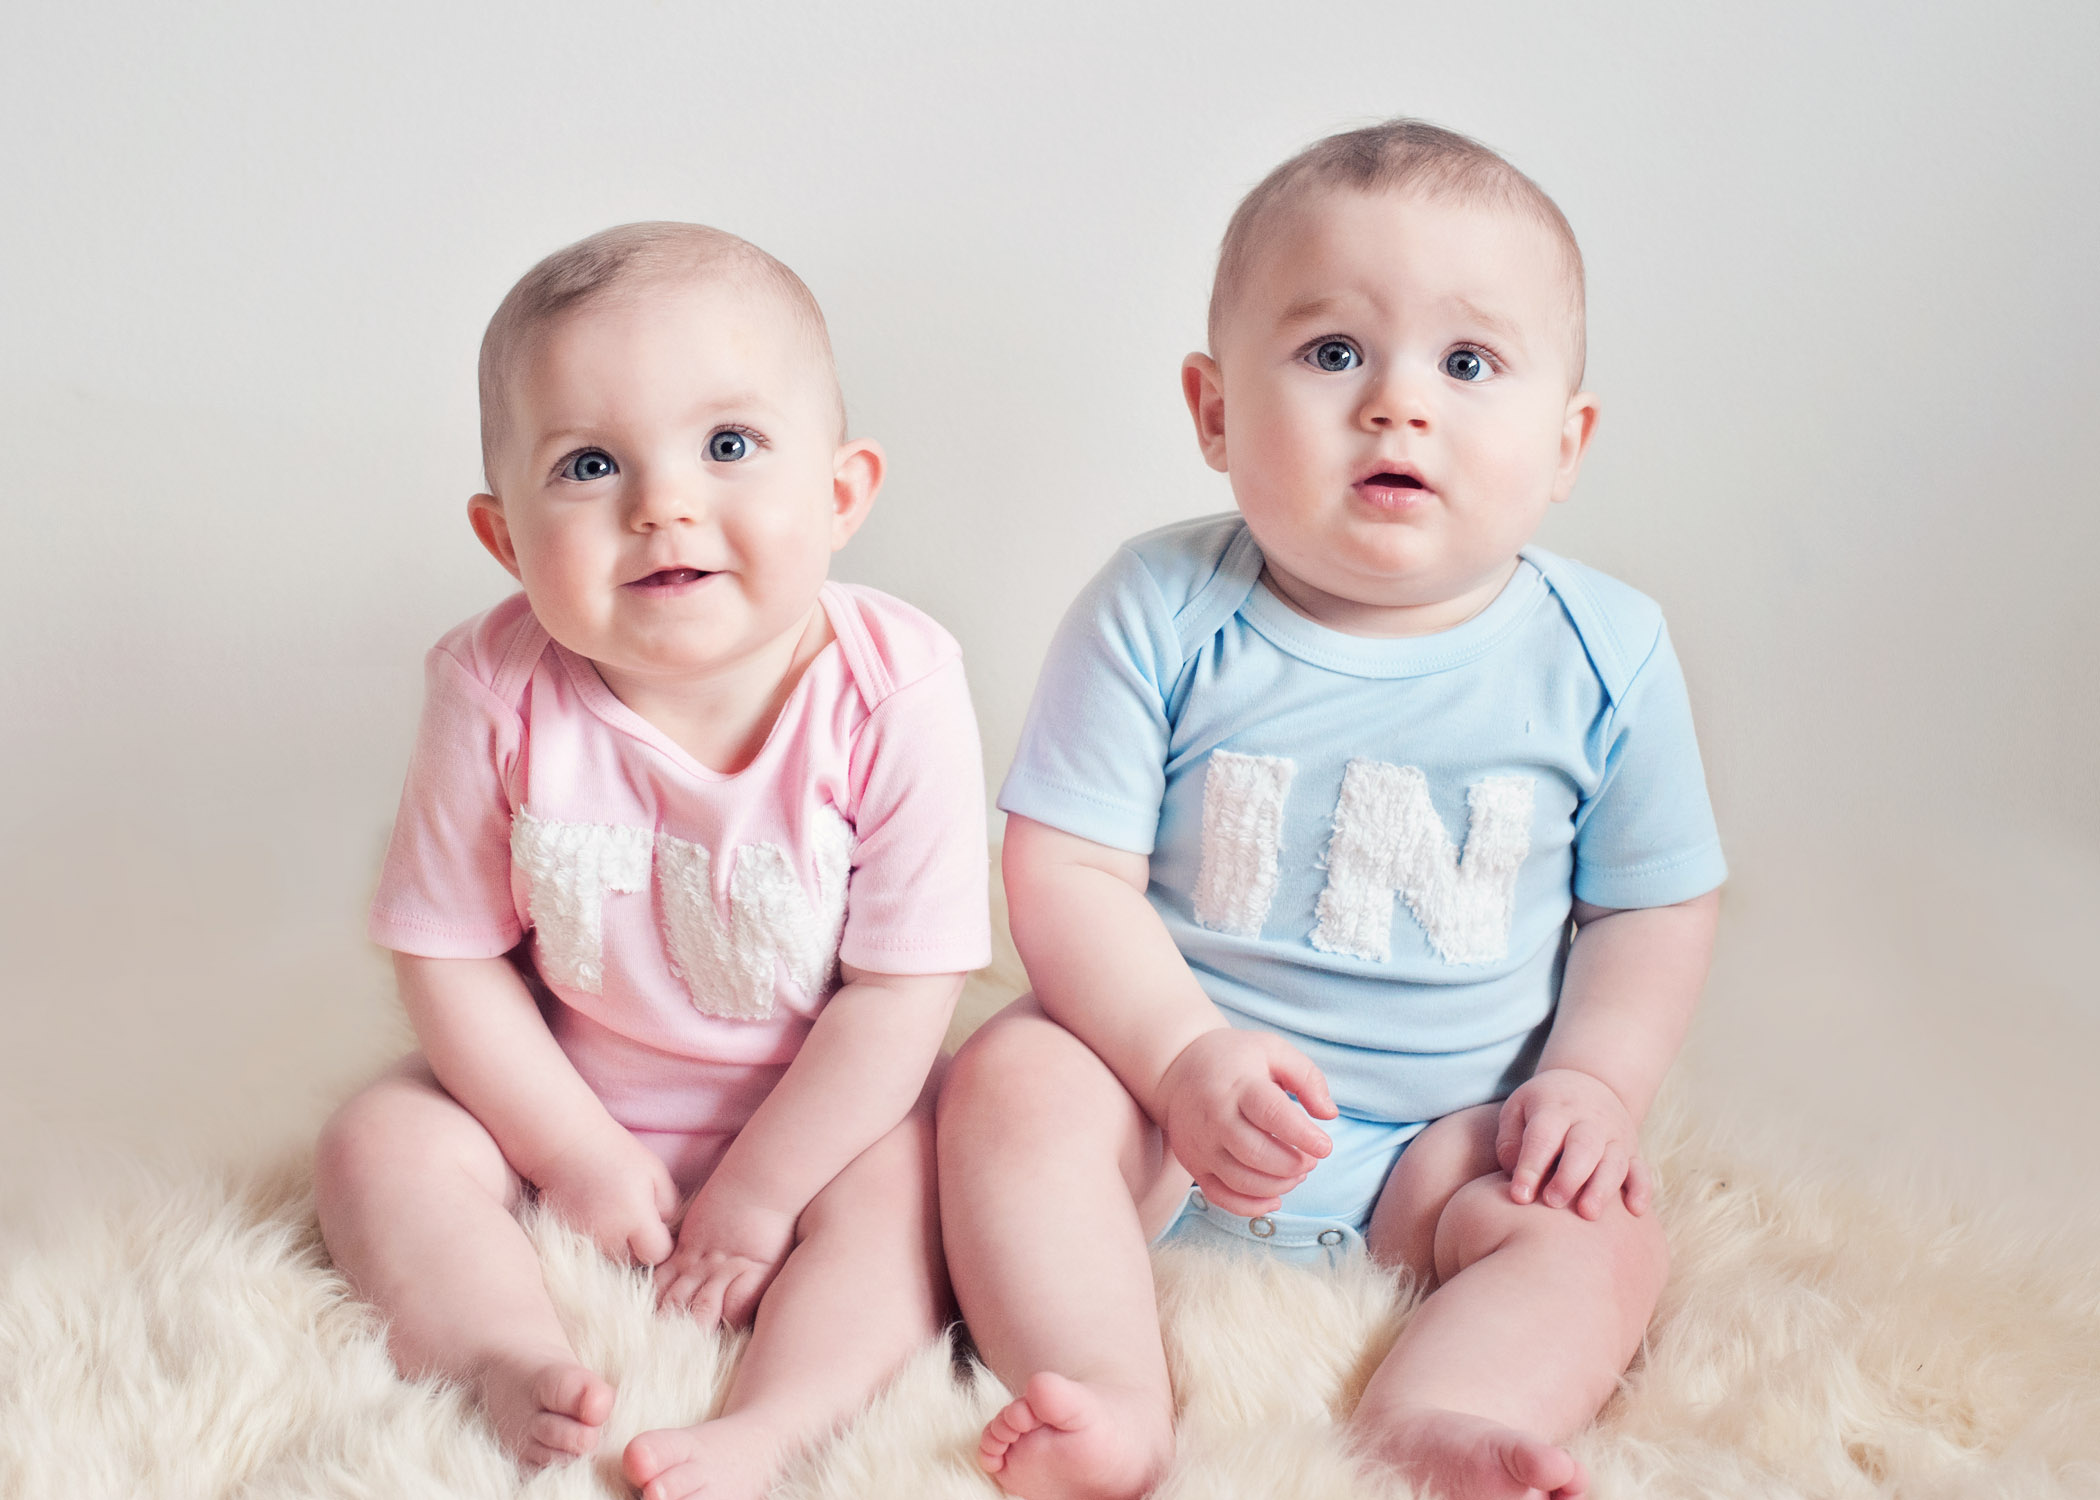 Cute Baby Boy 2 Wallpapers: صور اطفال توائم حلوين مواليد اجمل الاطفال التوائم